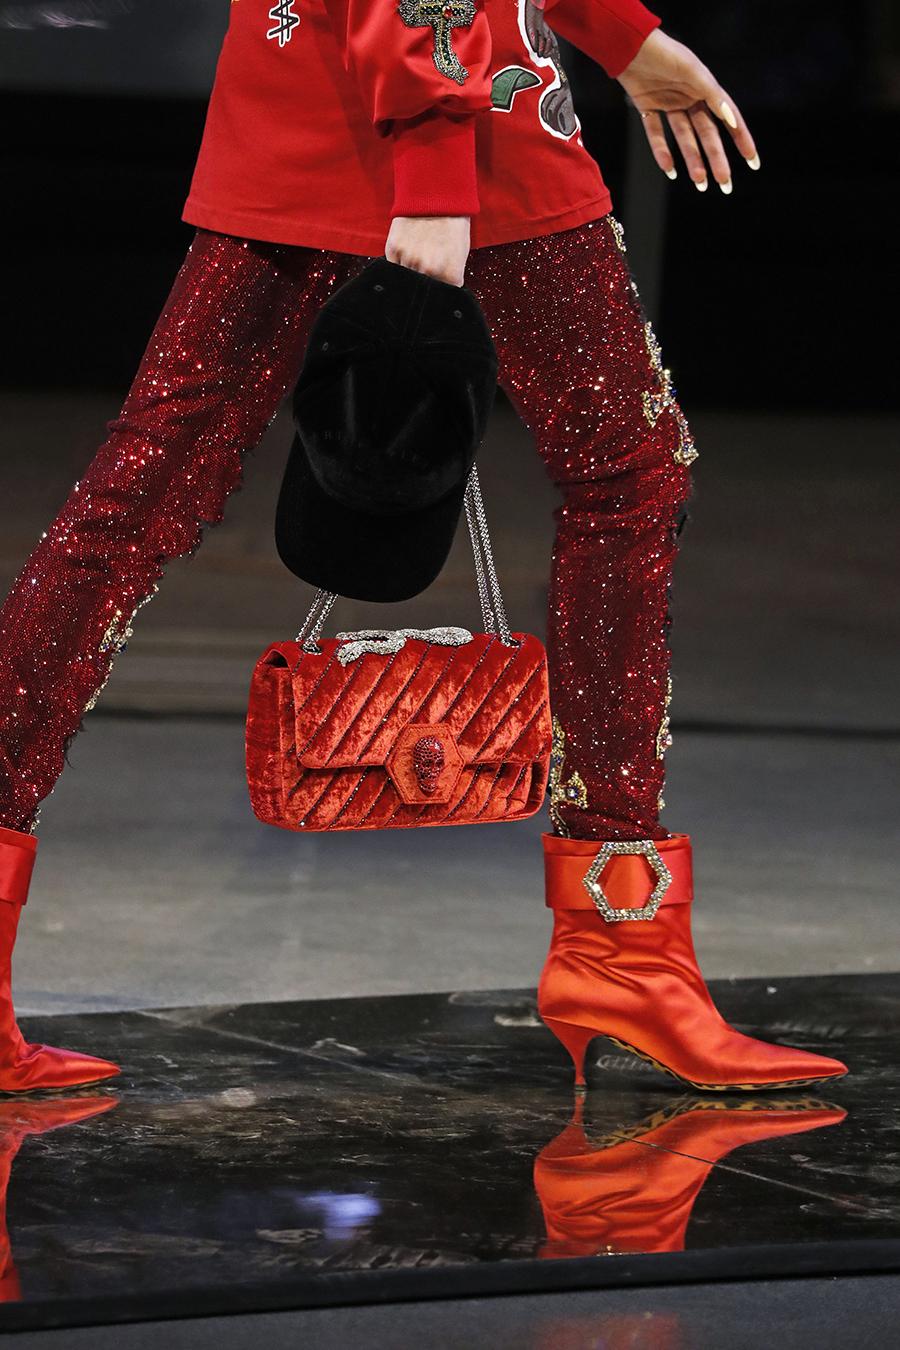 модная стеганая сумка осень зима 2020 2021 бархатная красная алая на цепочке